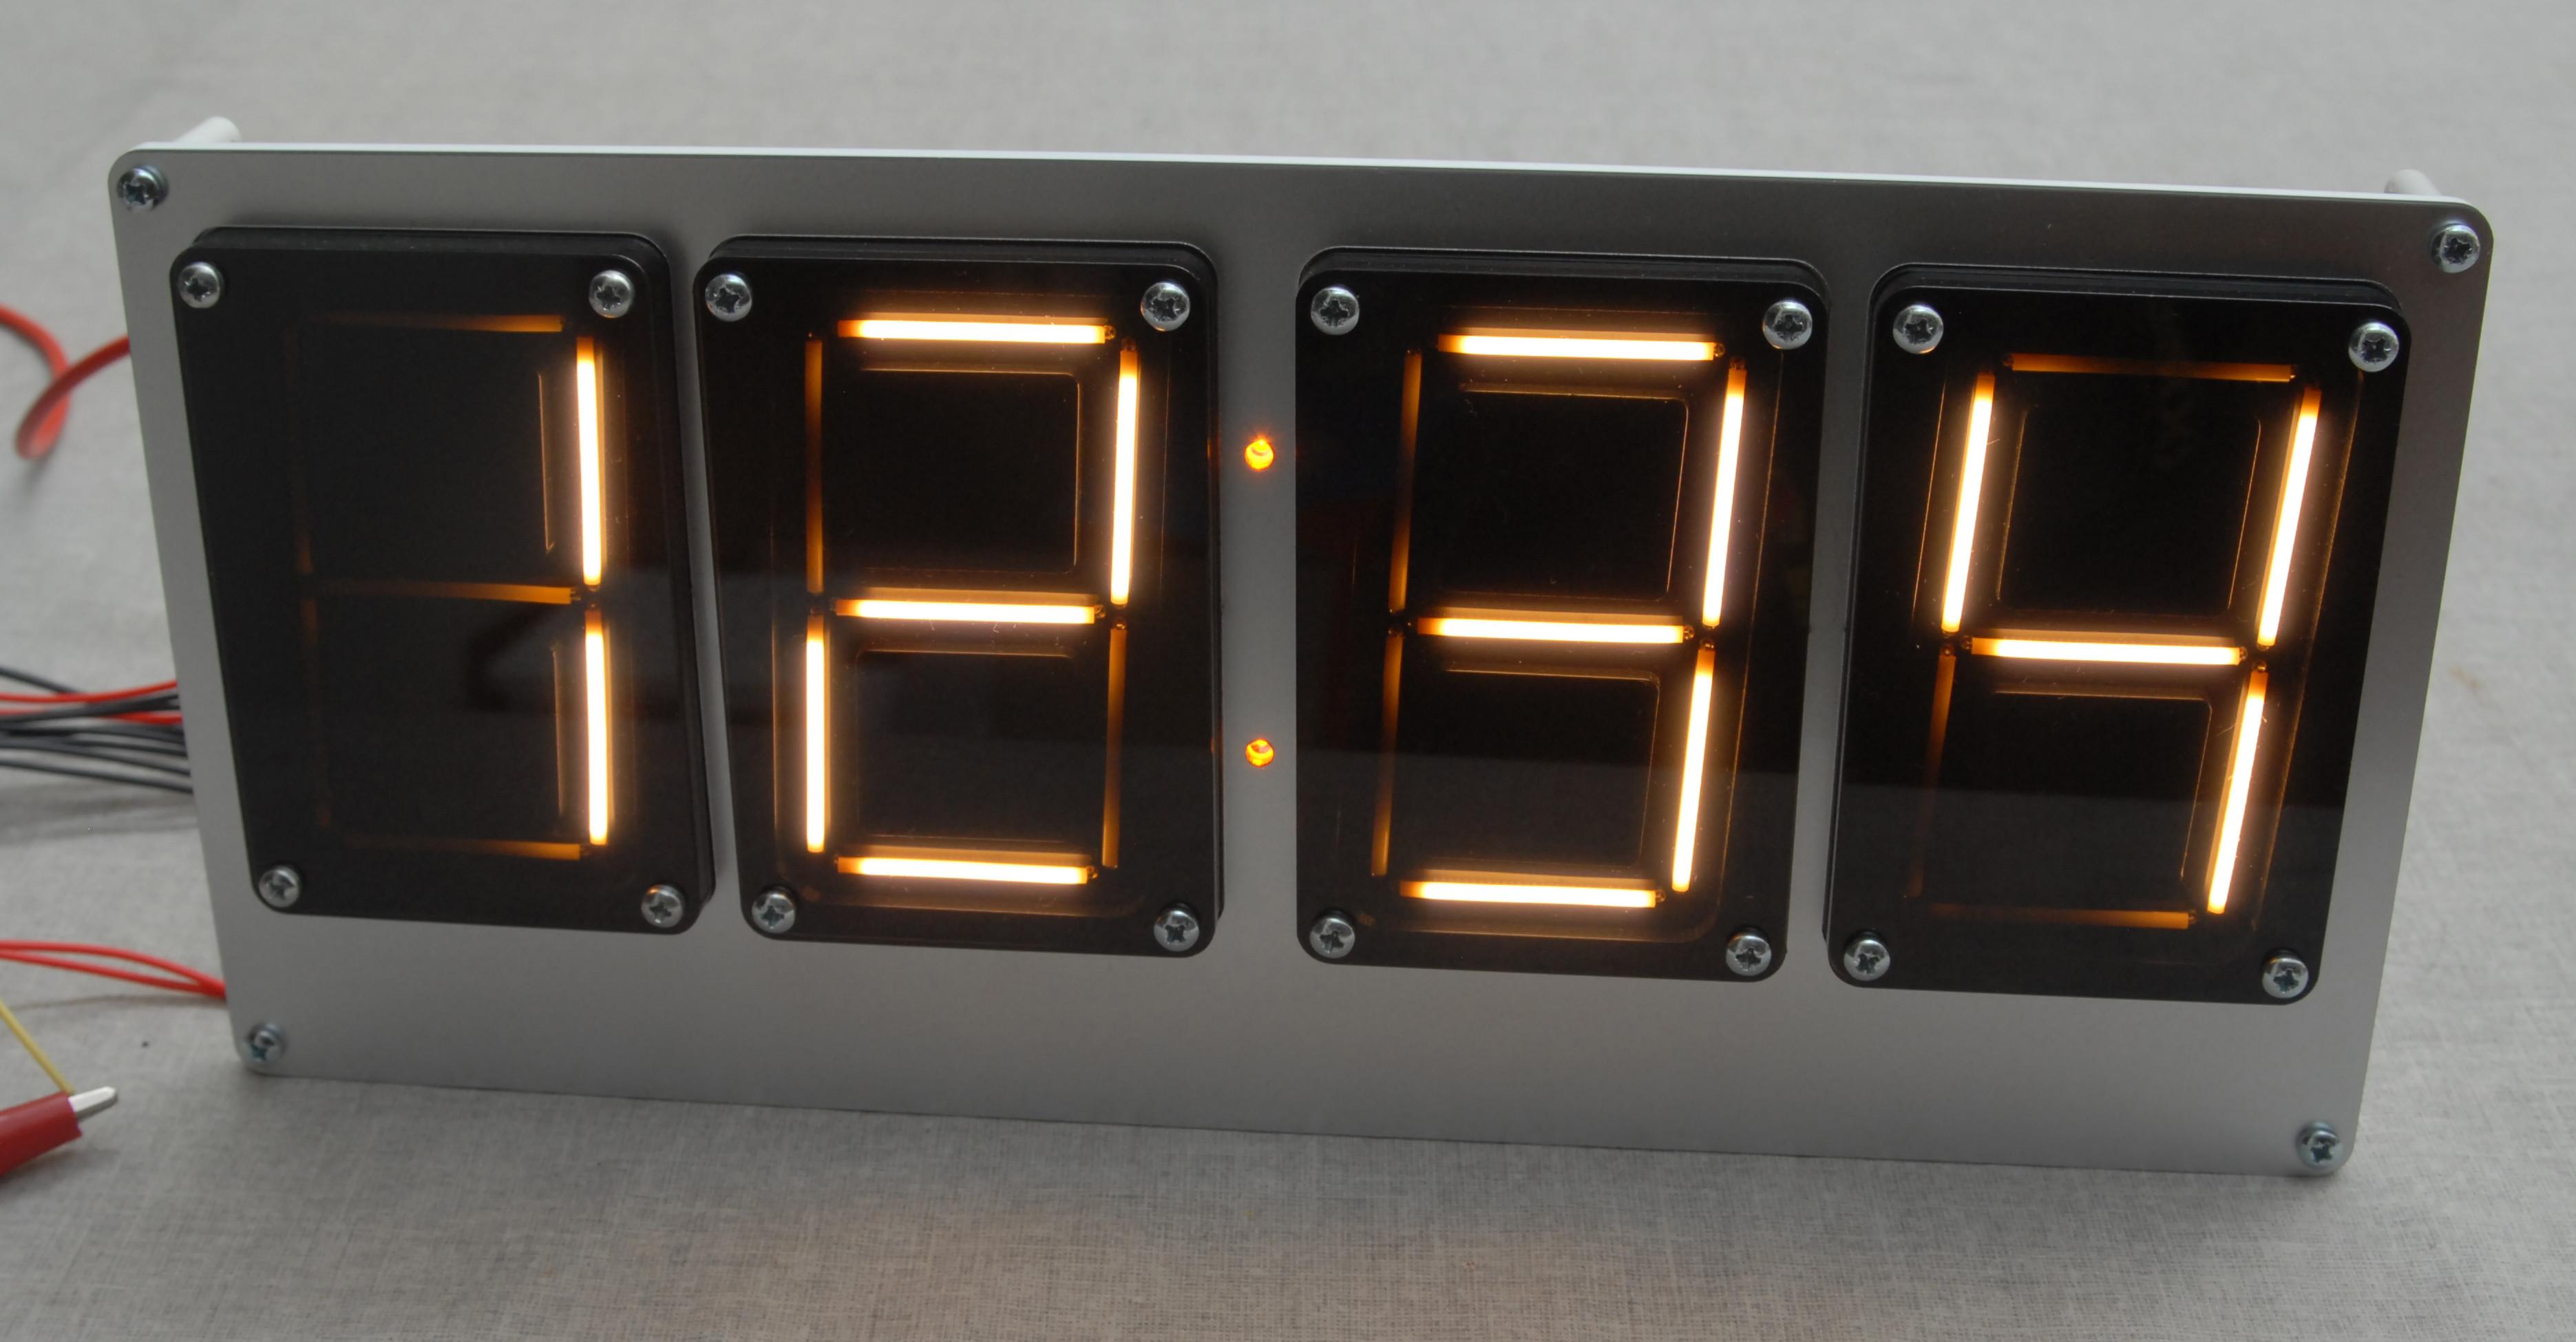 Leditron Display 150448 Elektor Labs Magazine Tda7563 Stmicro Electronics Integrated Circuit By St Ebay